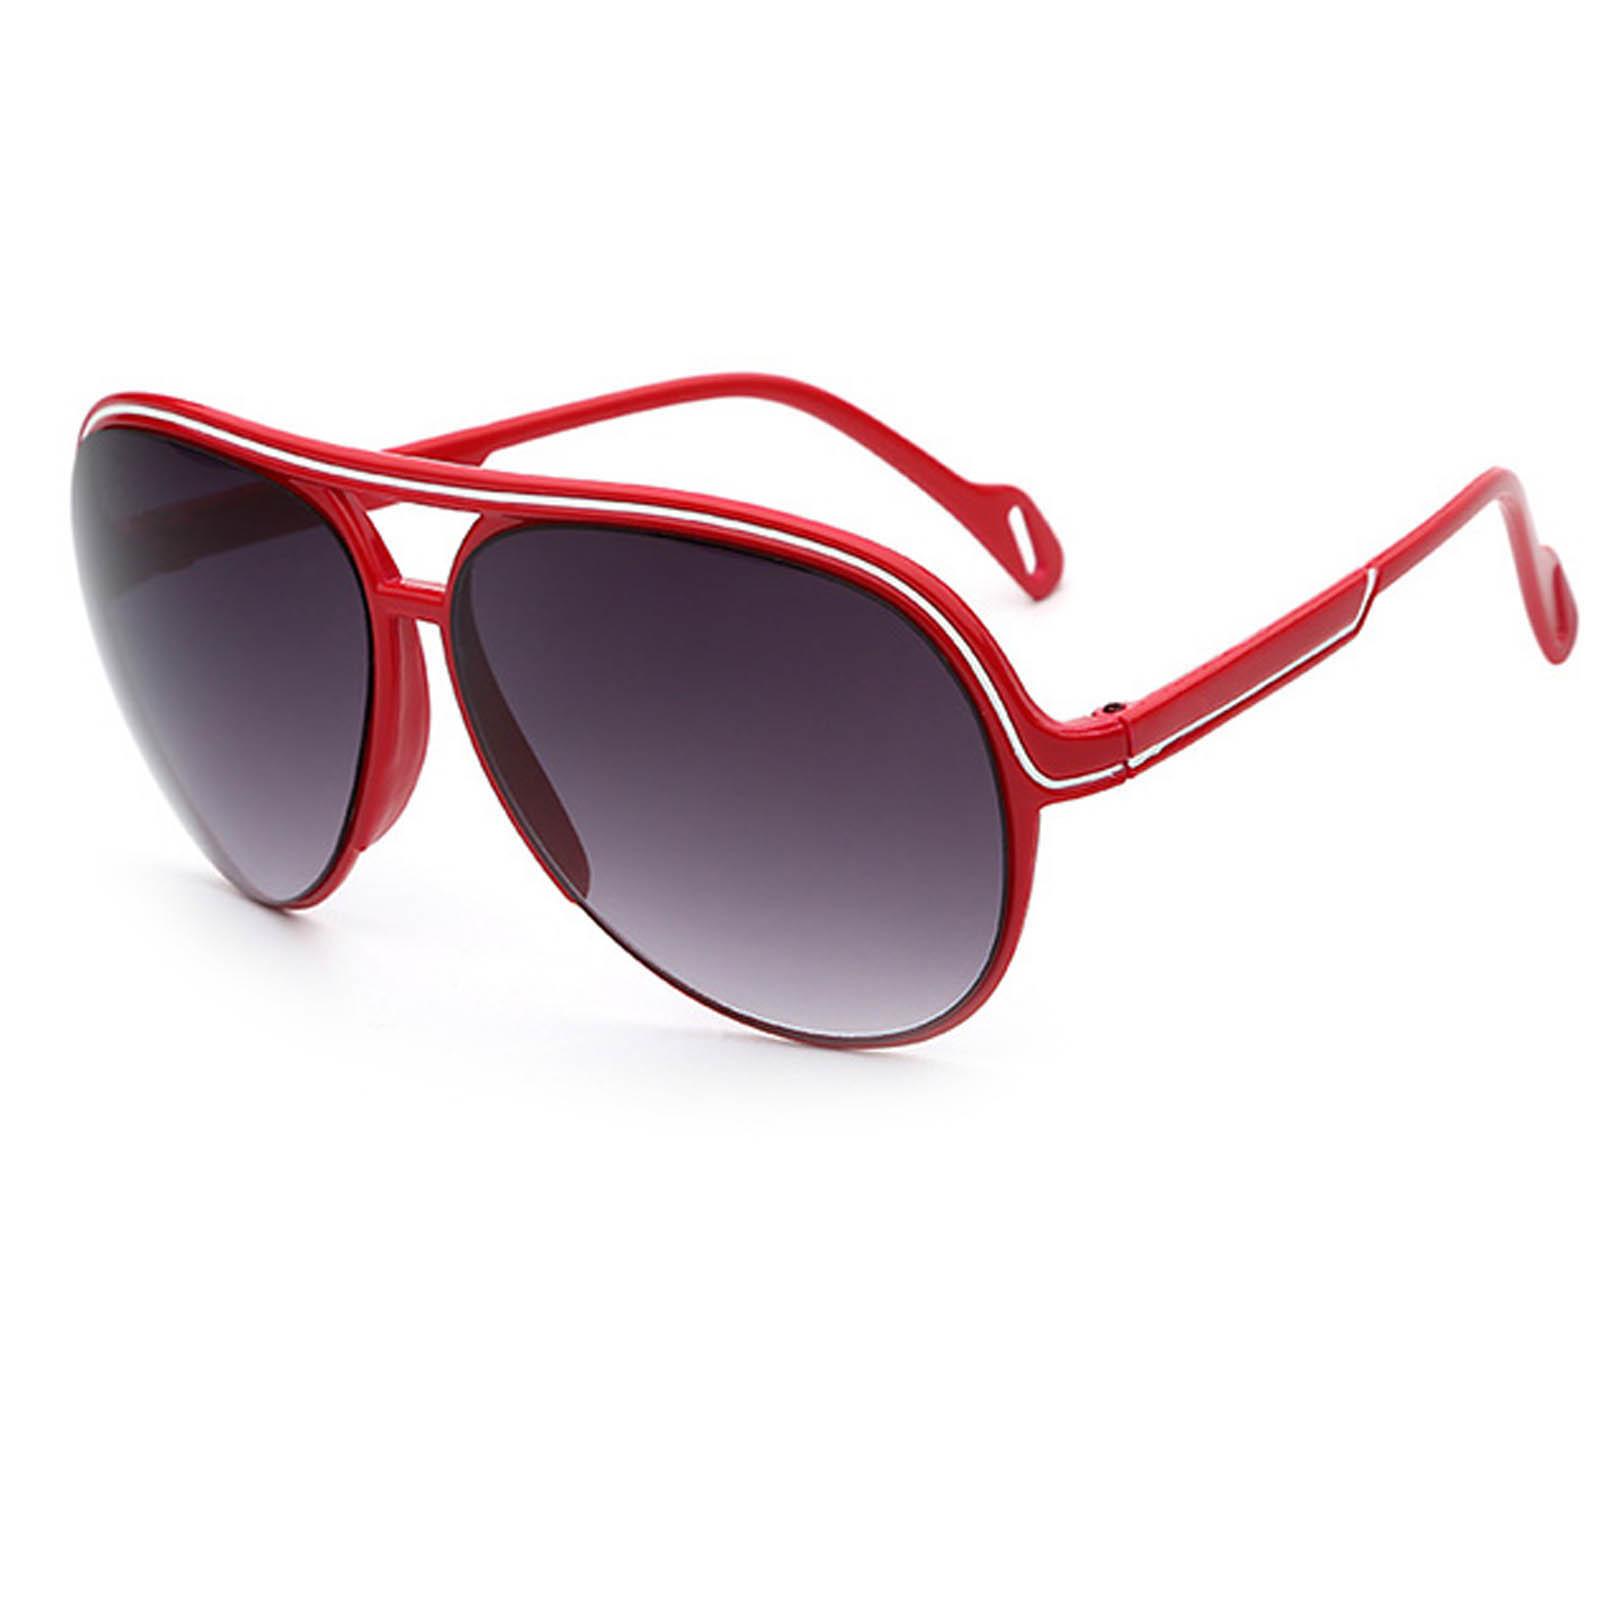 ce6c365183c OWL ® 047 C3 Aviator Eyewear Sunglasses Women s Men s Plastic Red Frame  Smoke Lens One Pair